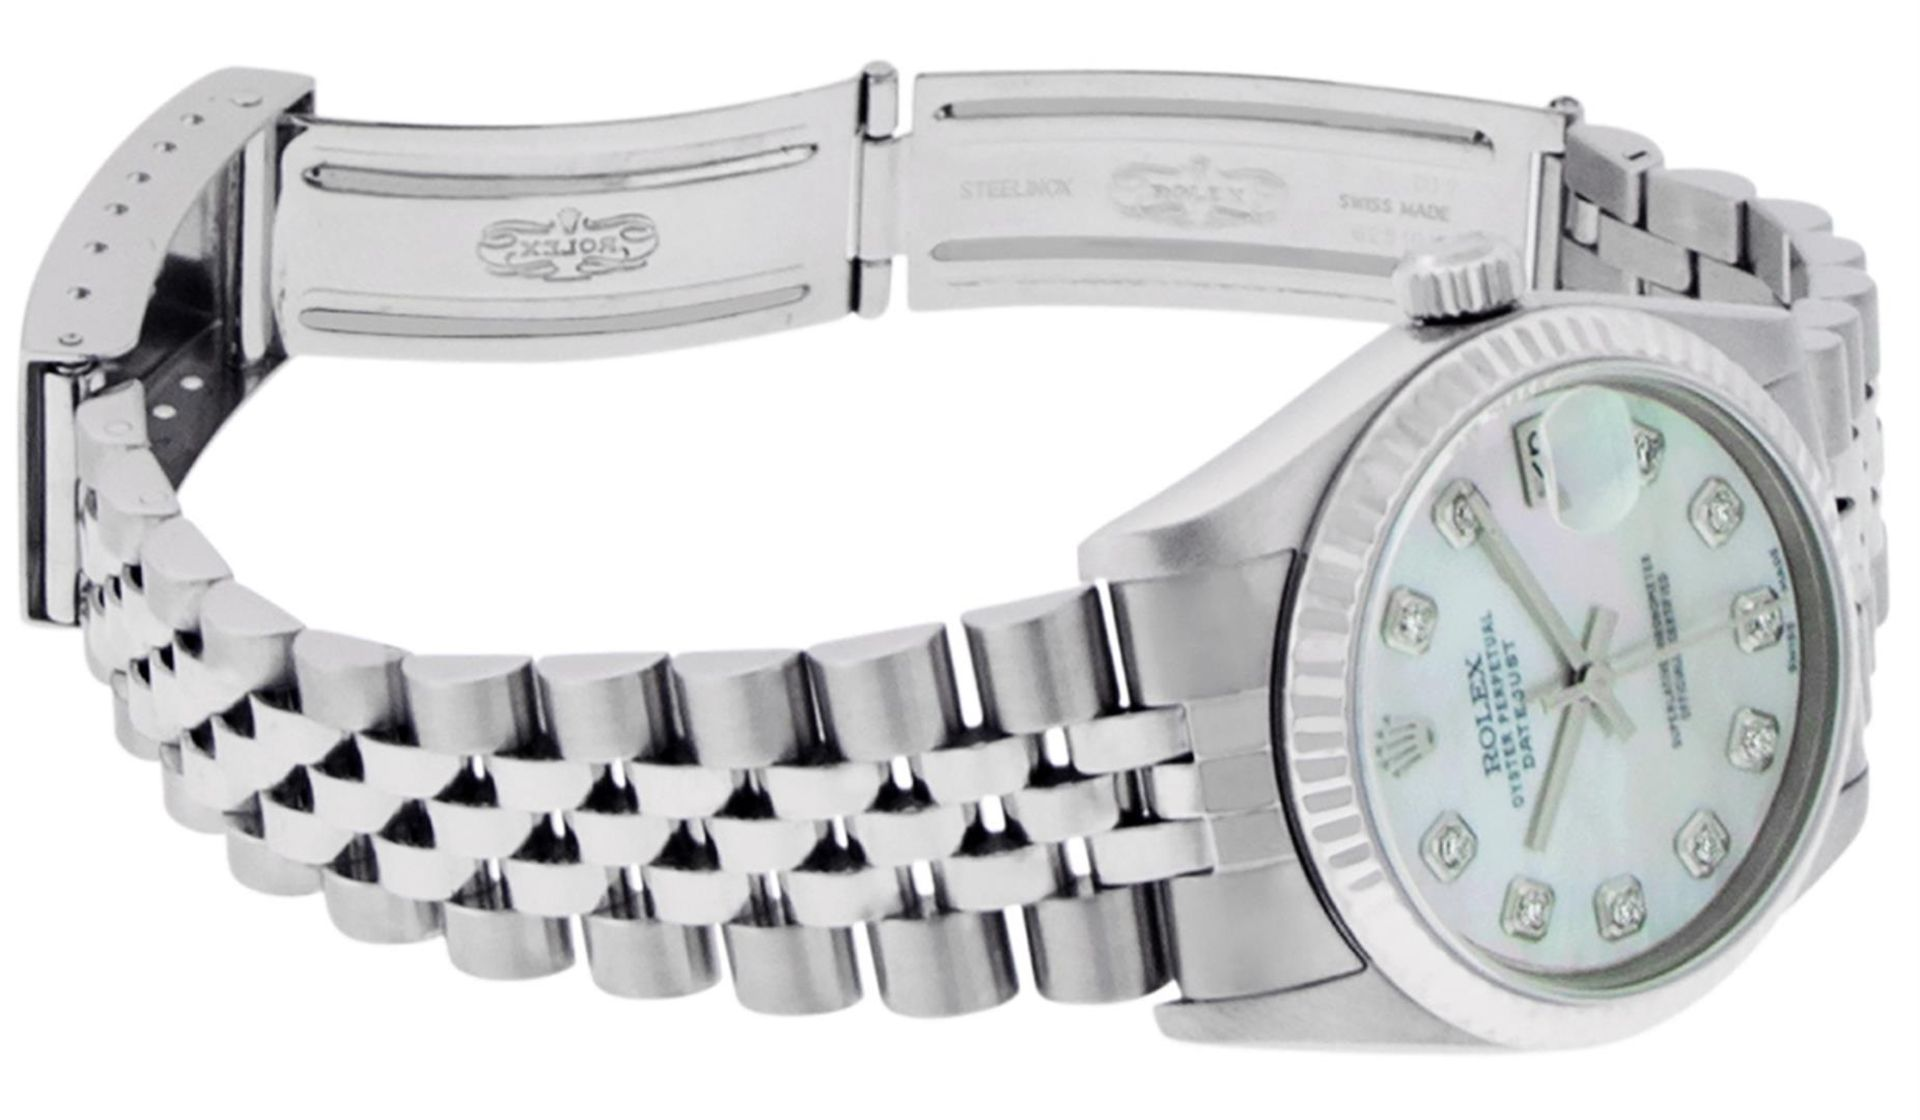 Rolex Womens Midsize Quickset 31mm MOP Diamond Stainless Steel Datejust Wriswatc - Image 9 of 9